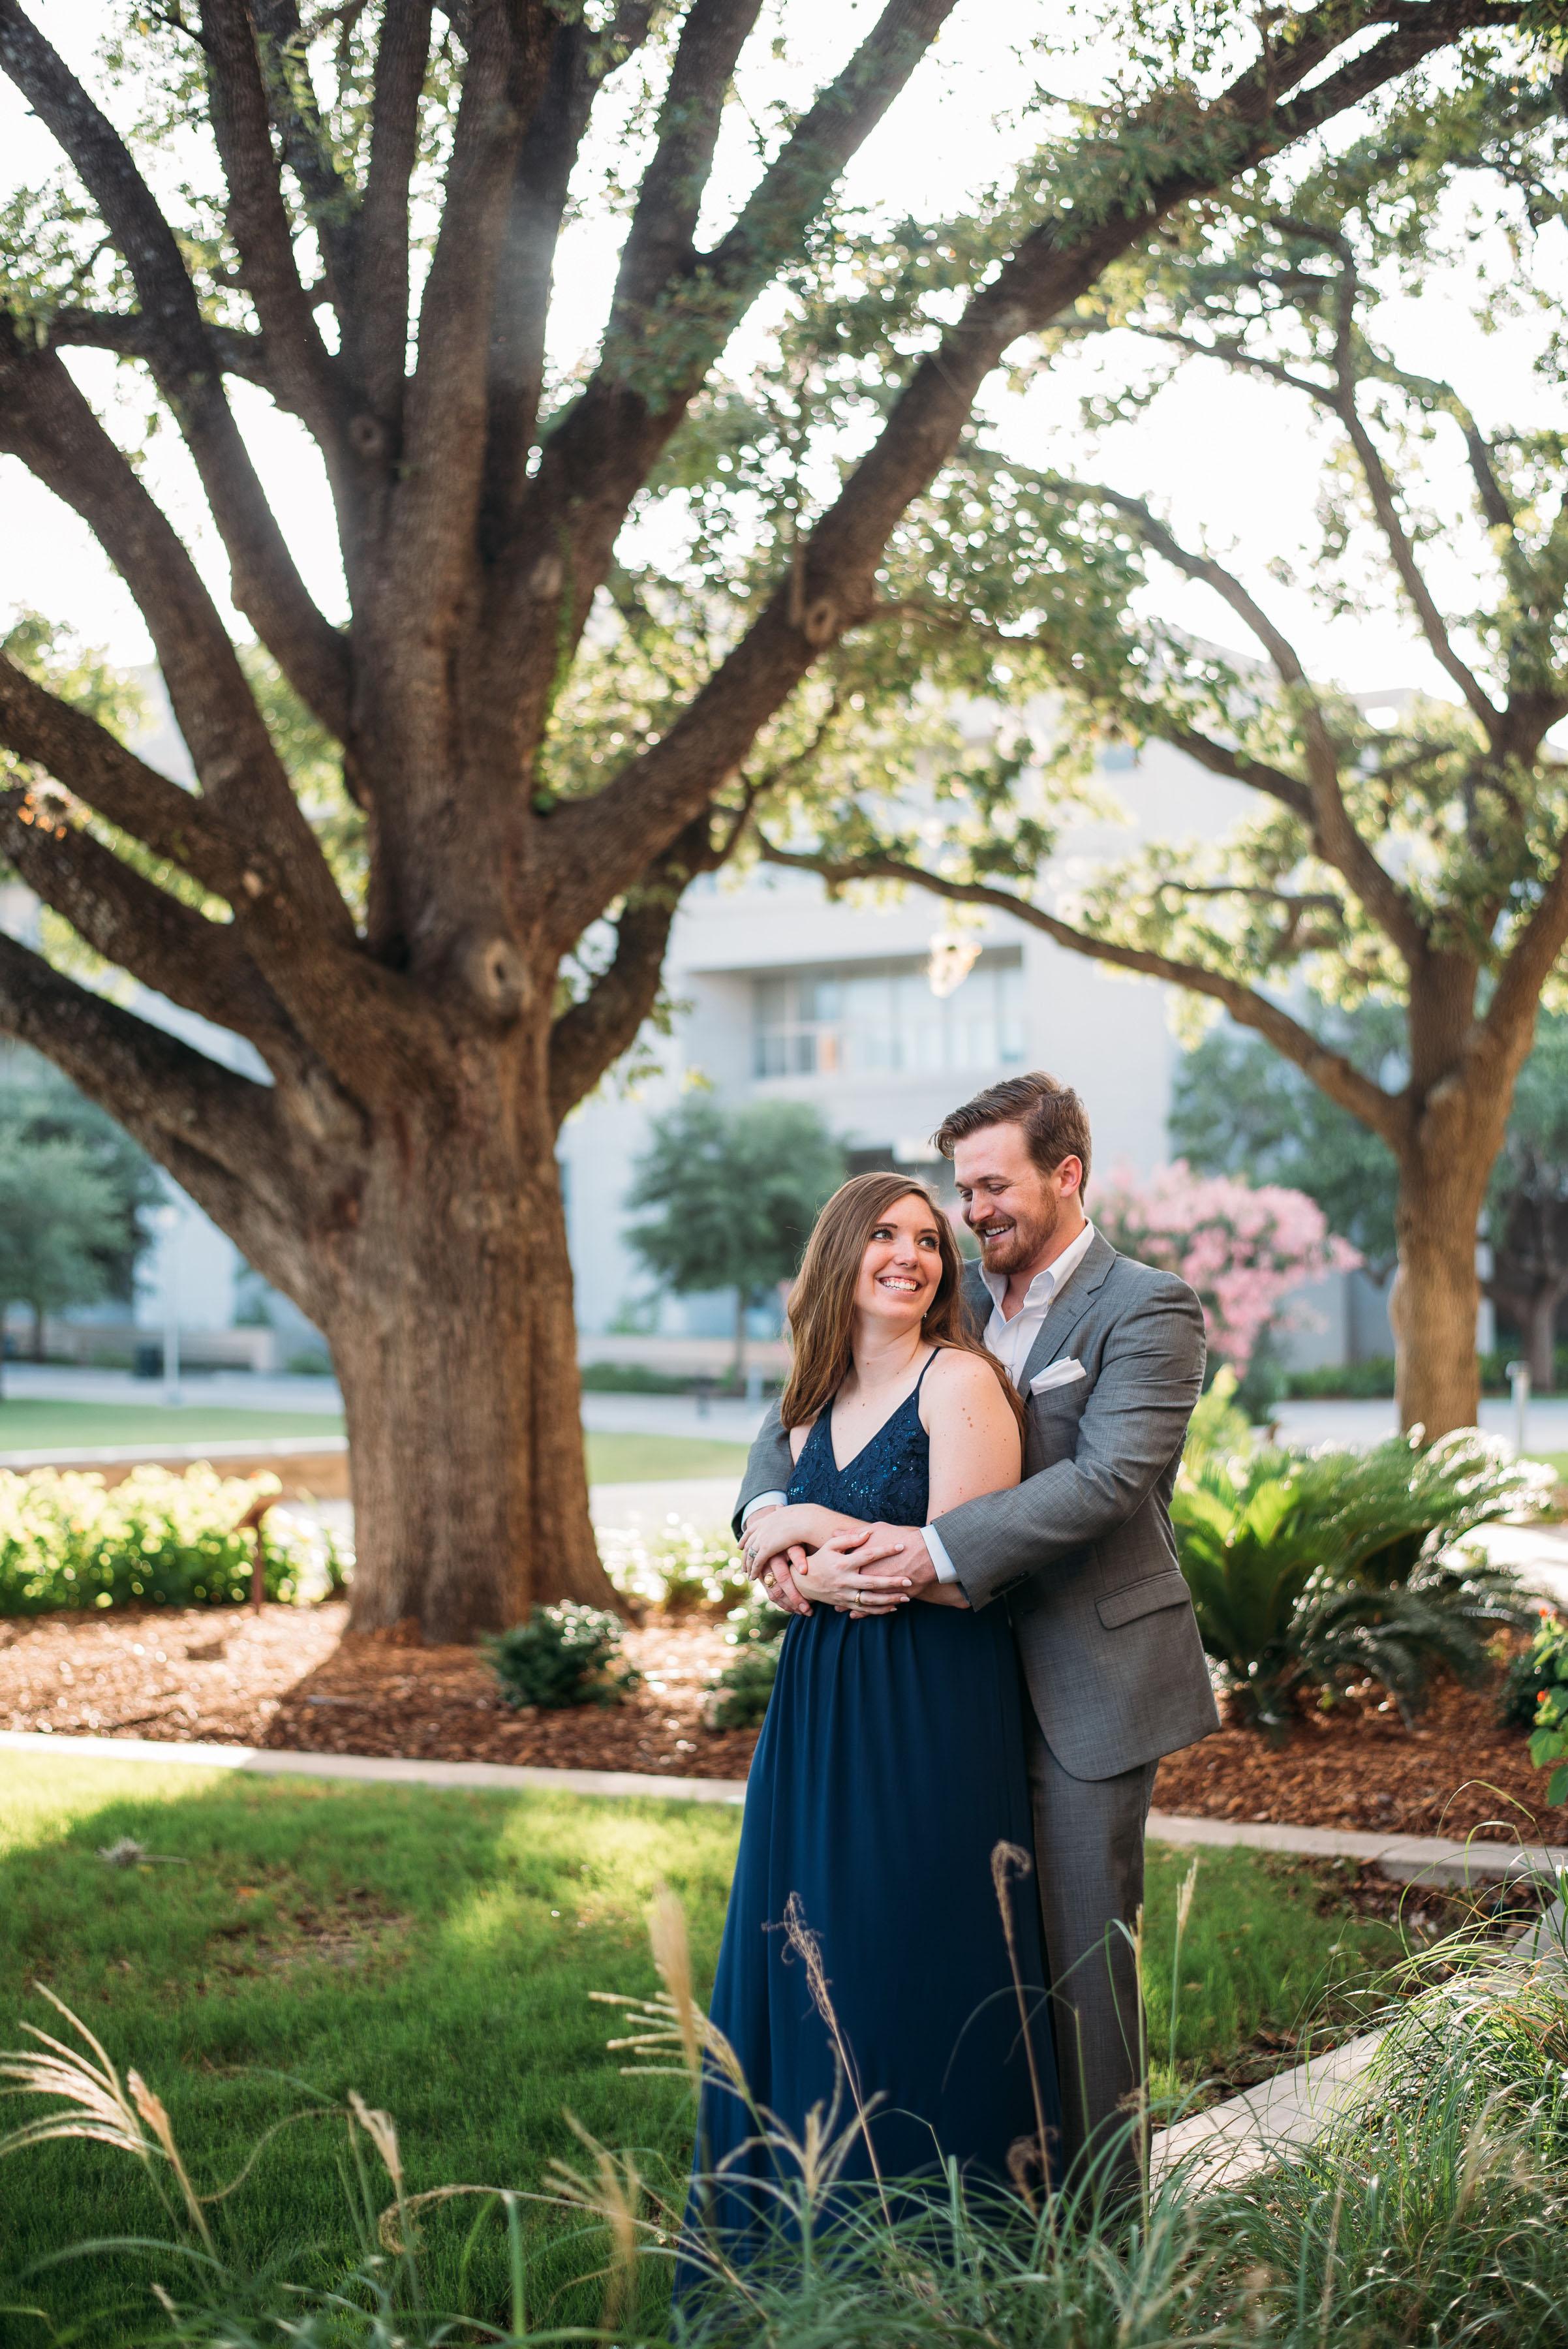 Texas-A&M-University-Engagement-College-Station-Wedding-Photographer-San-Angel-Photo-Mark-Johanna-Century-Tree-15.jpg